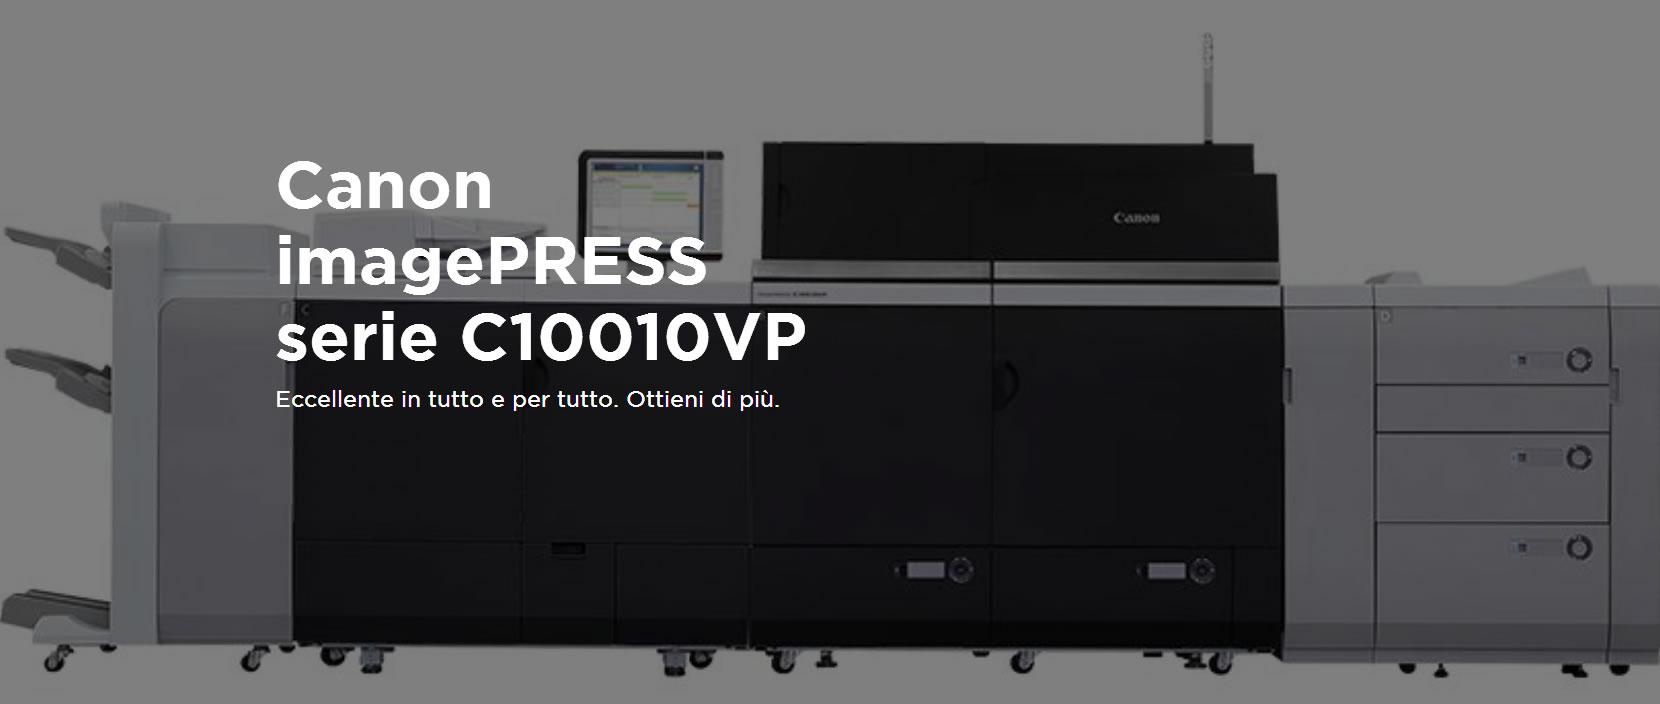 Canon imagePRESS serie C10010VP